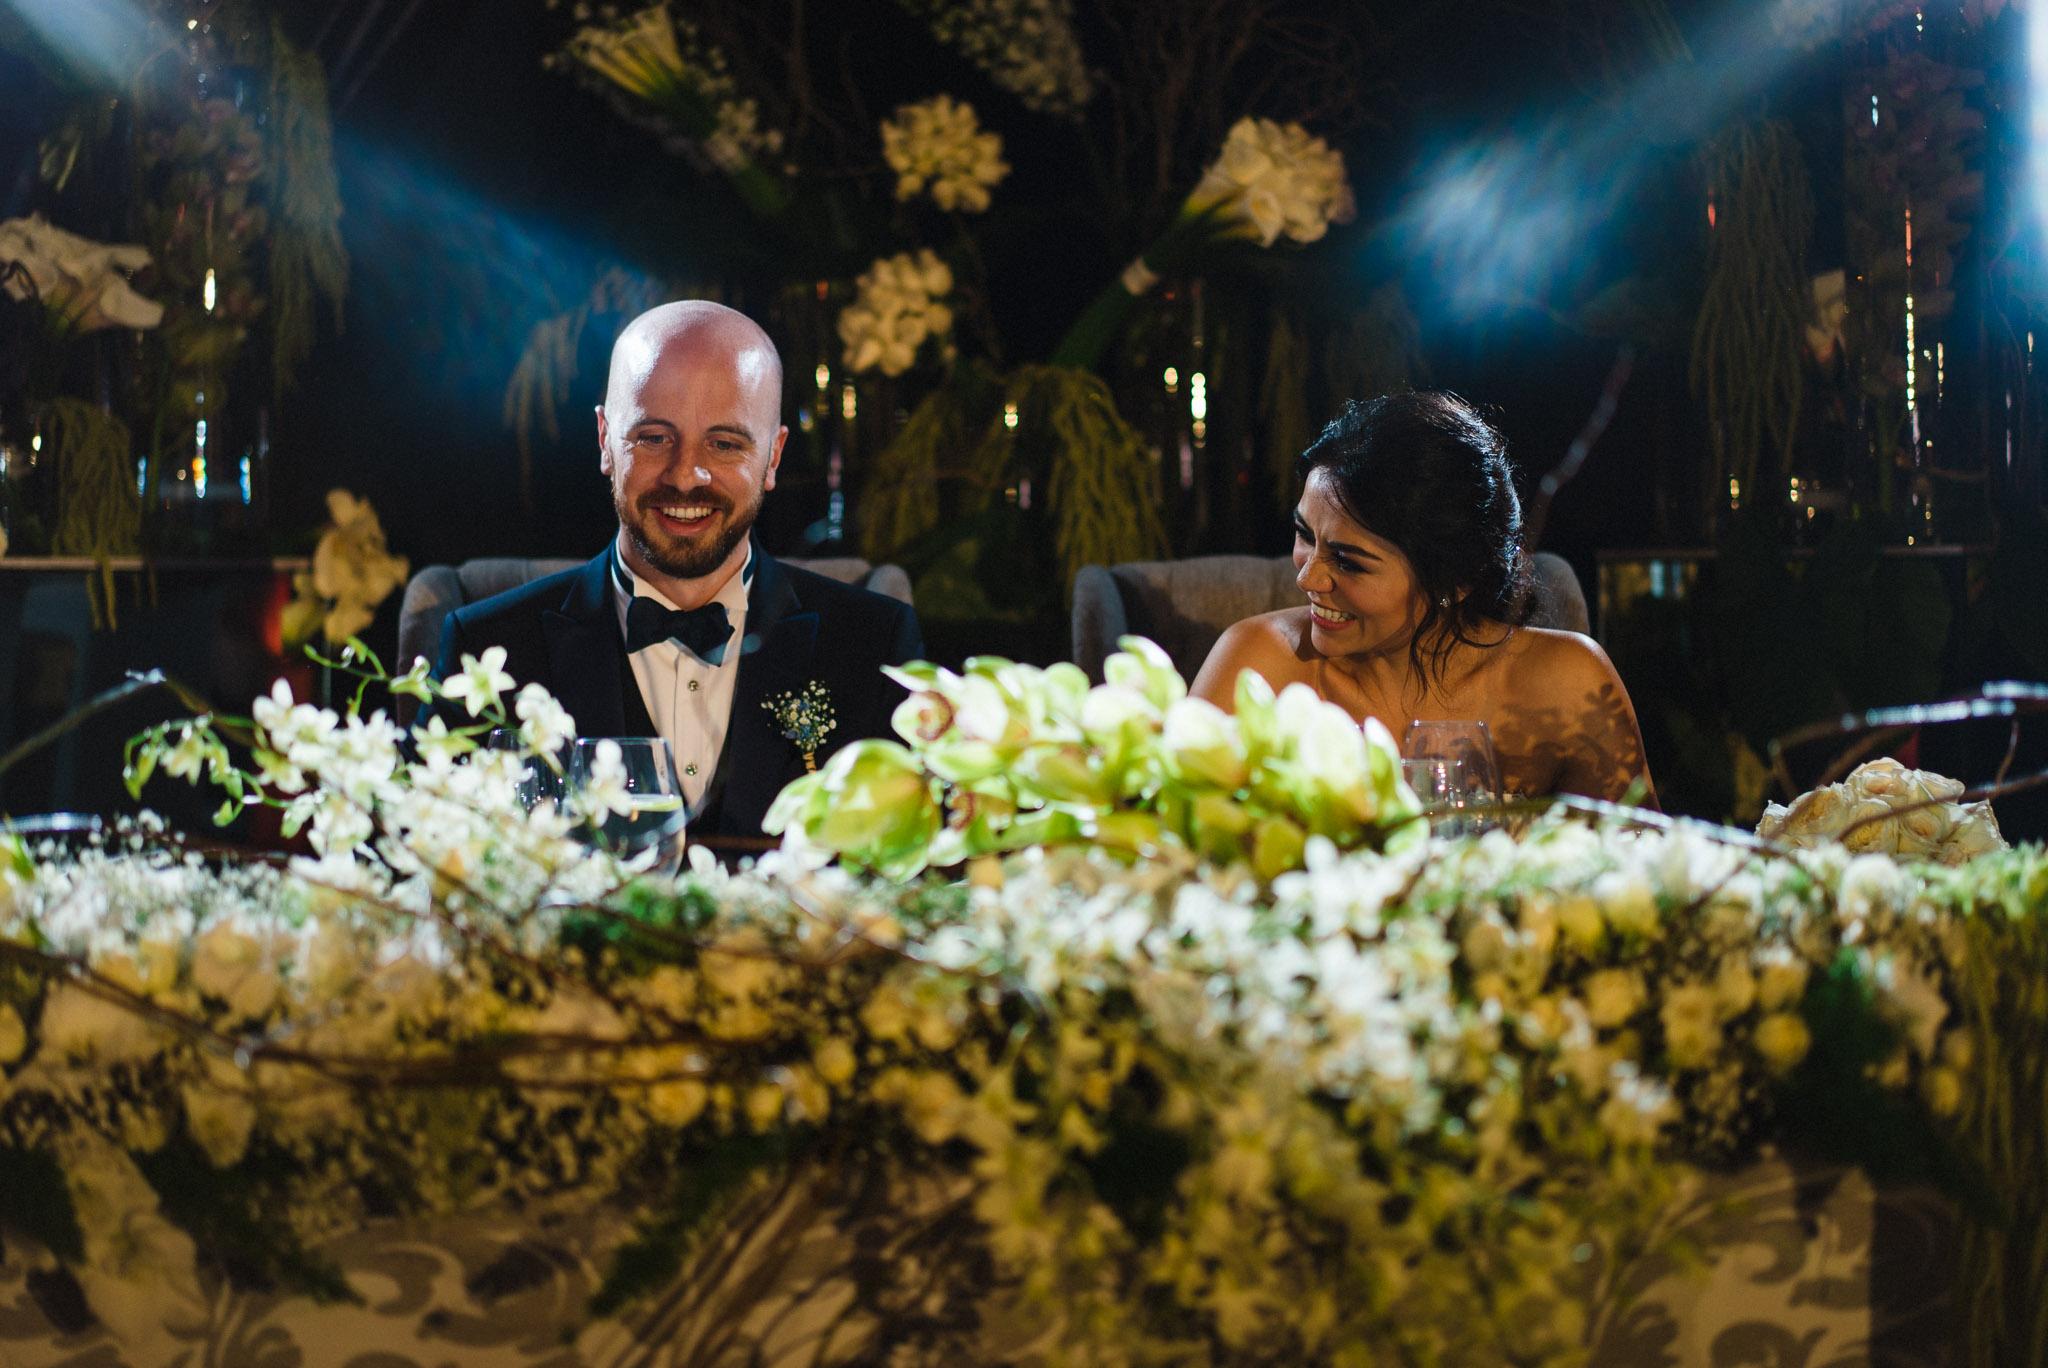 ©www.mauriziosolisbroca.com-20161001maurizio-solis-broca-mexico-canada-wedding-photographer20161001DSC08135-Edit.jpg